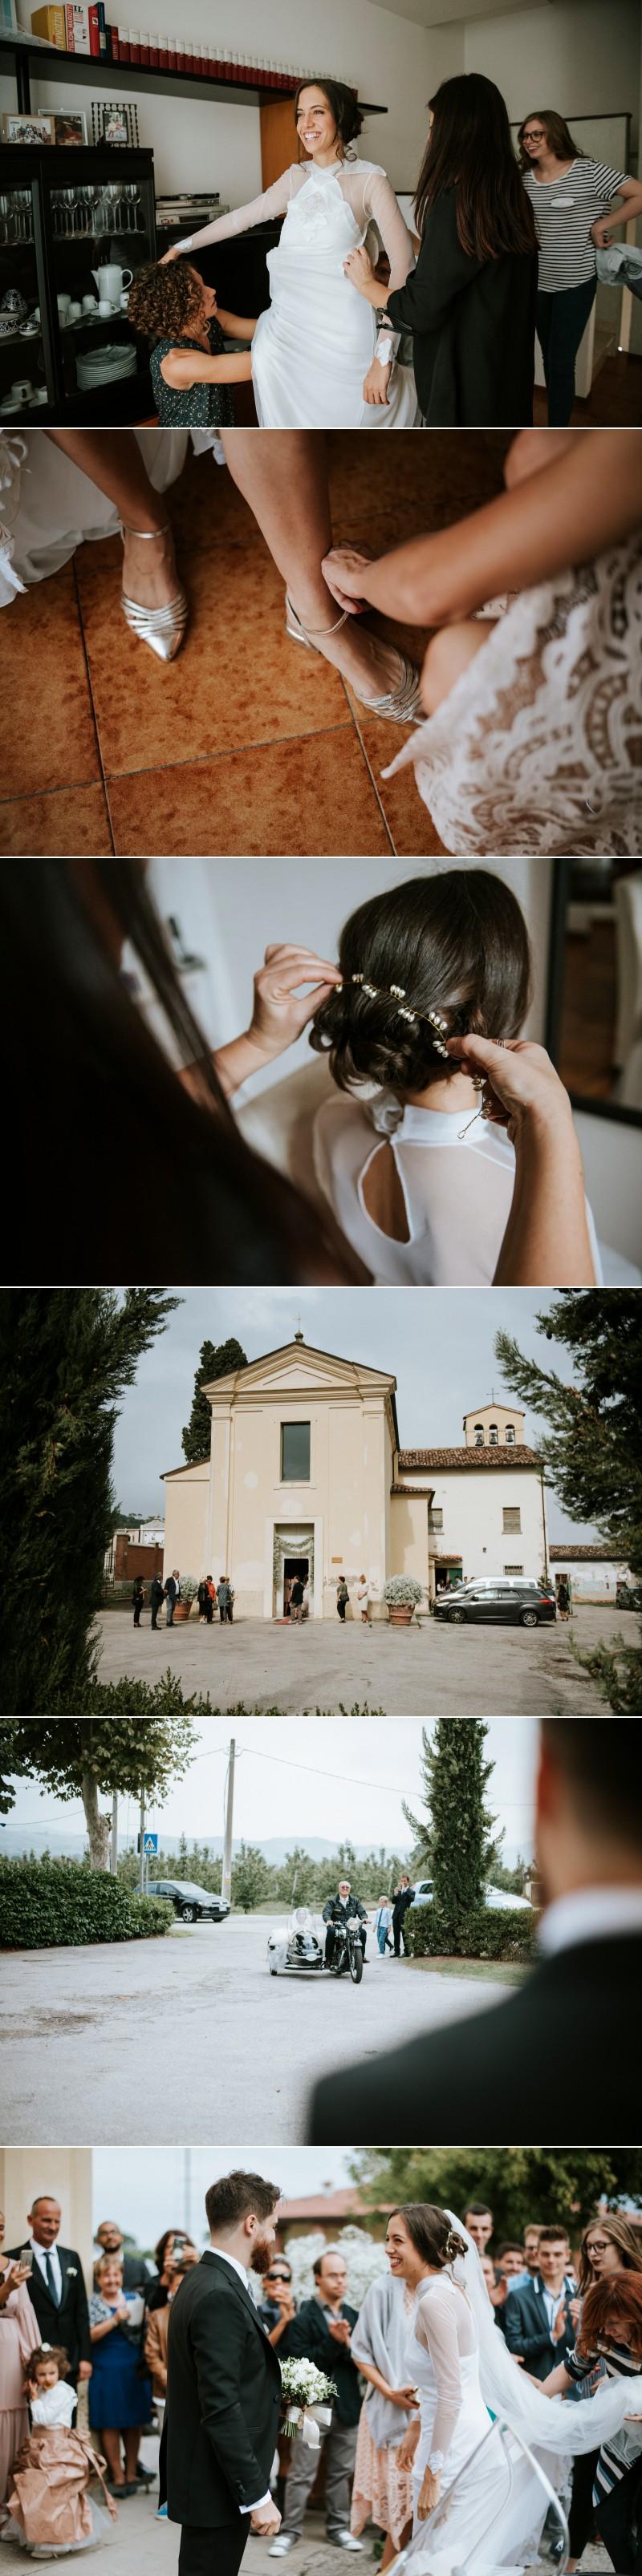 Bologna Ravenna Destination Wedding Photographer 2